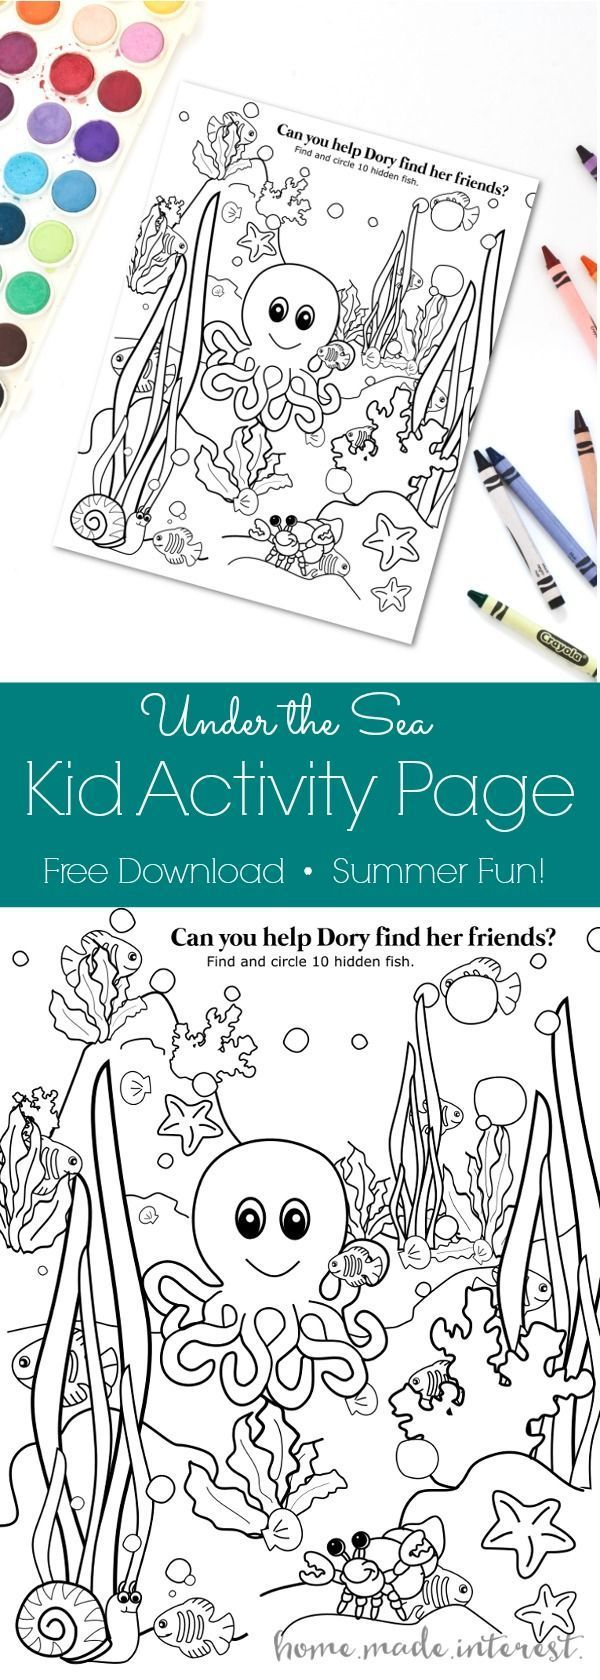 53 best Spring Unit images on Pinterest   Activities for kids, Kite ...